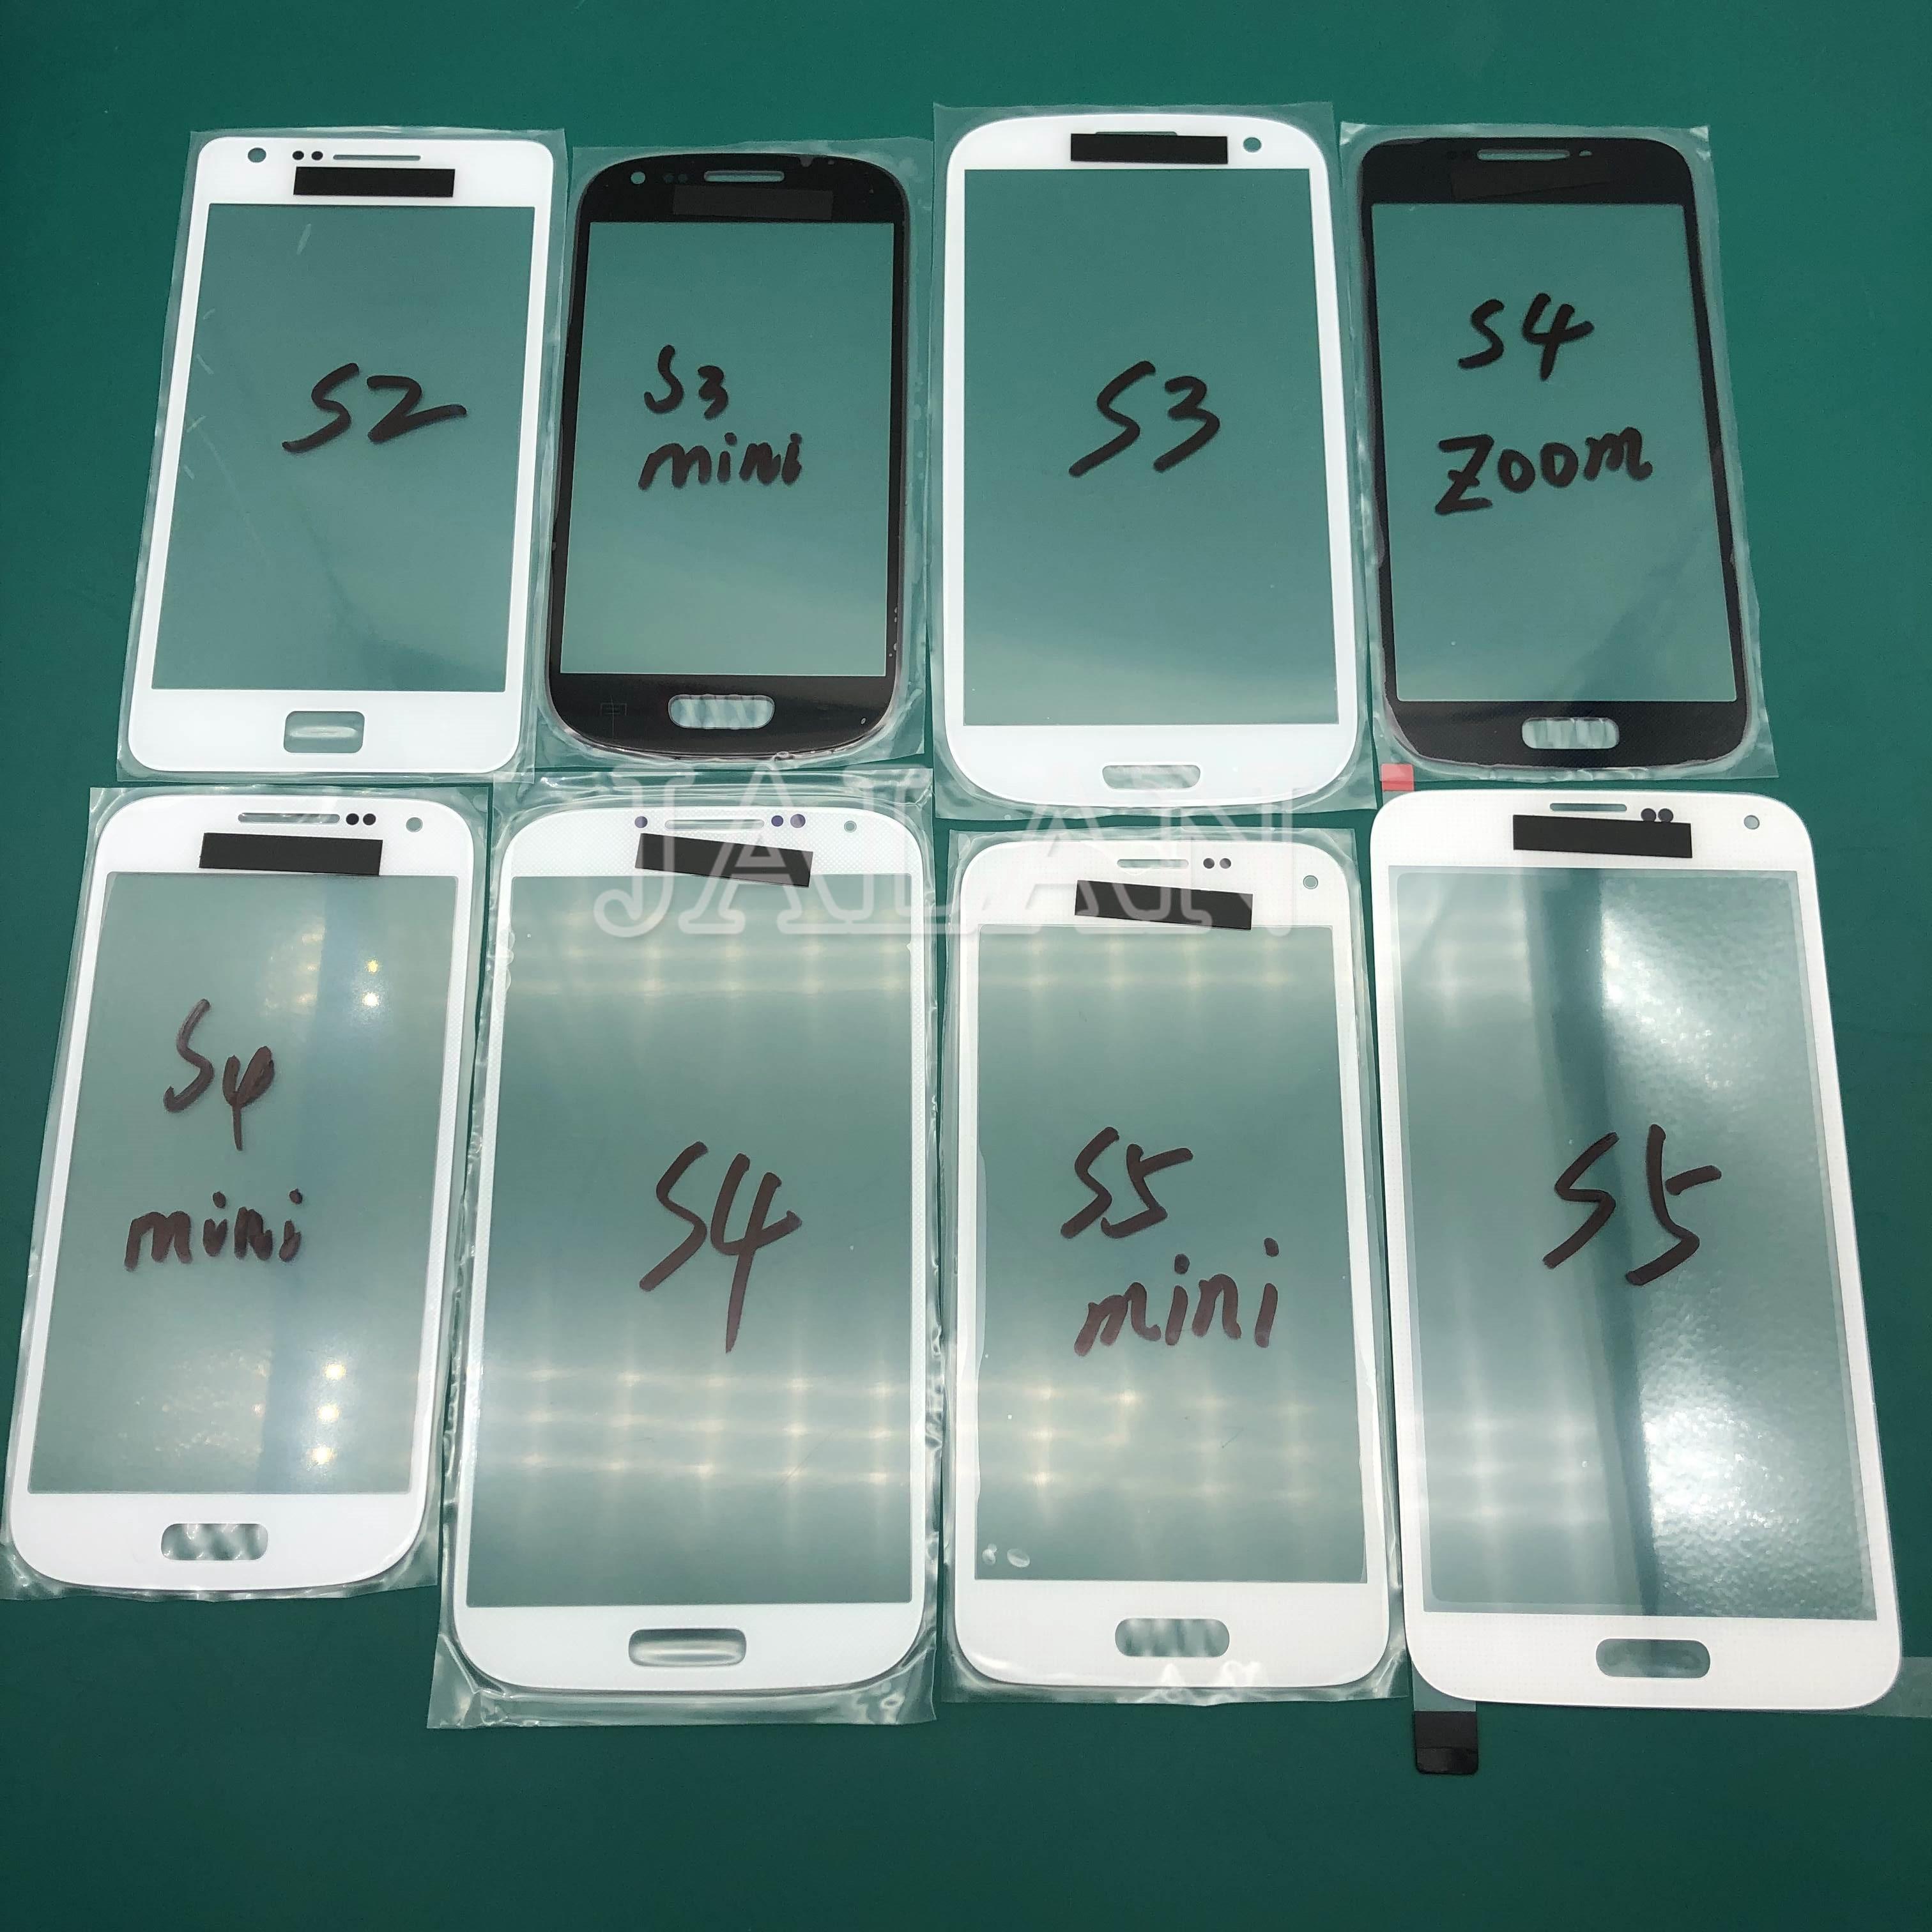 Jalan 5 Pcs untuk SM S4/S4 Mini/S4 Zoom Depan Kaca Touch I9500 I9190 C101 Retak Kaca pengganti Sentuh Layar Perbaikan